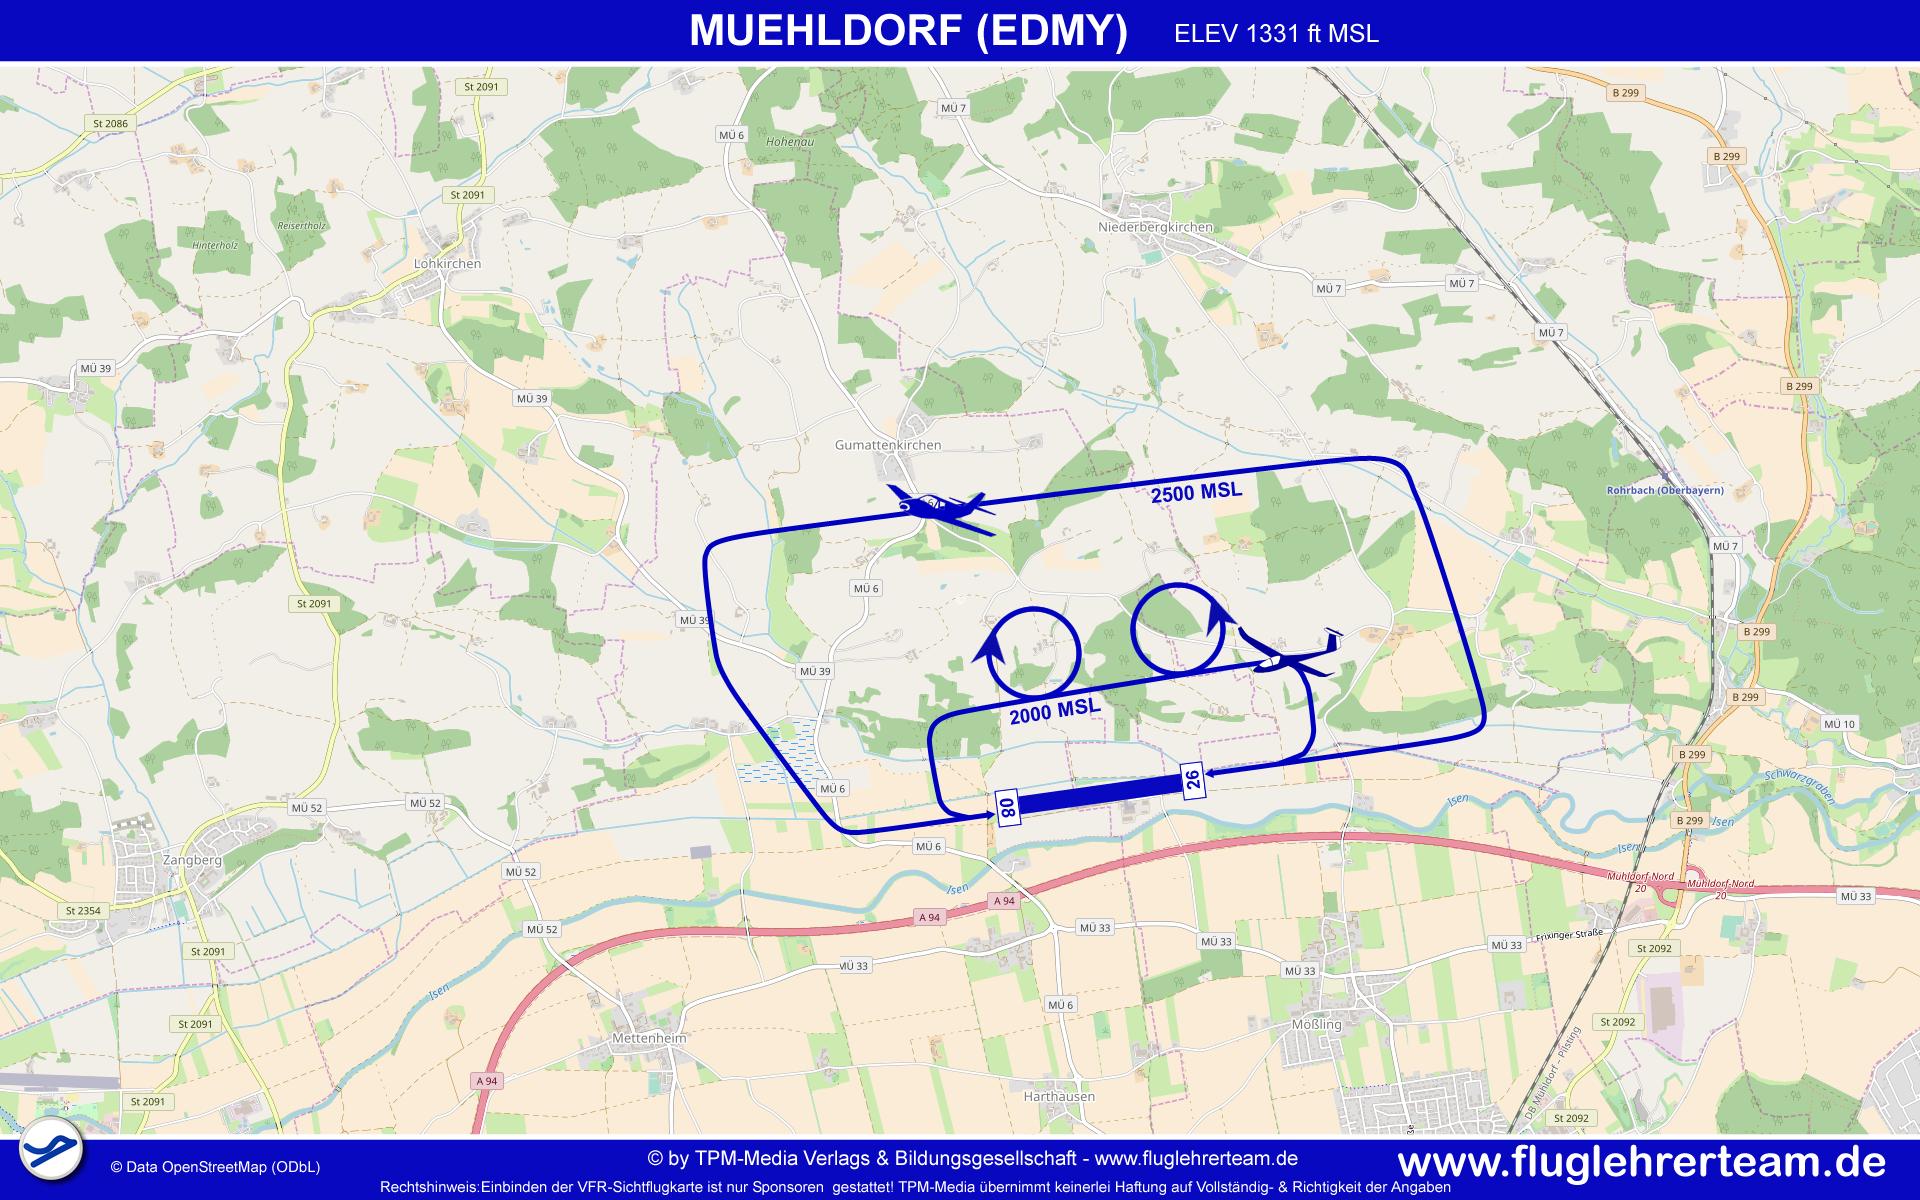 edmy-fluglehrerteam-de